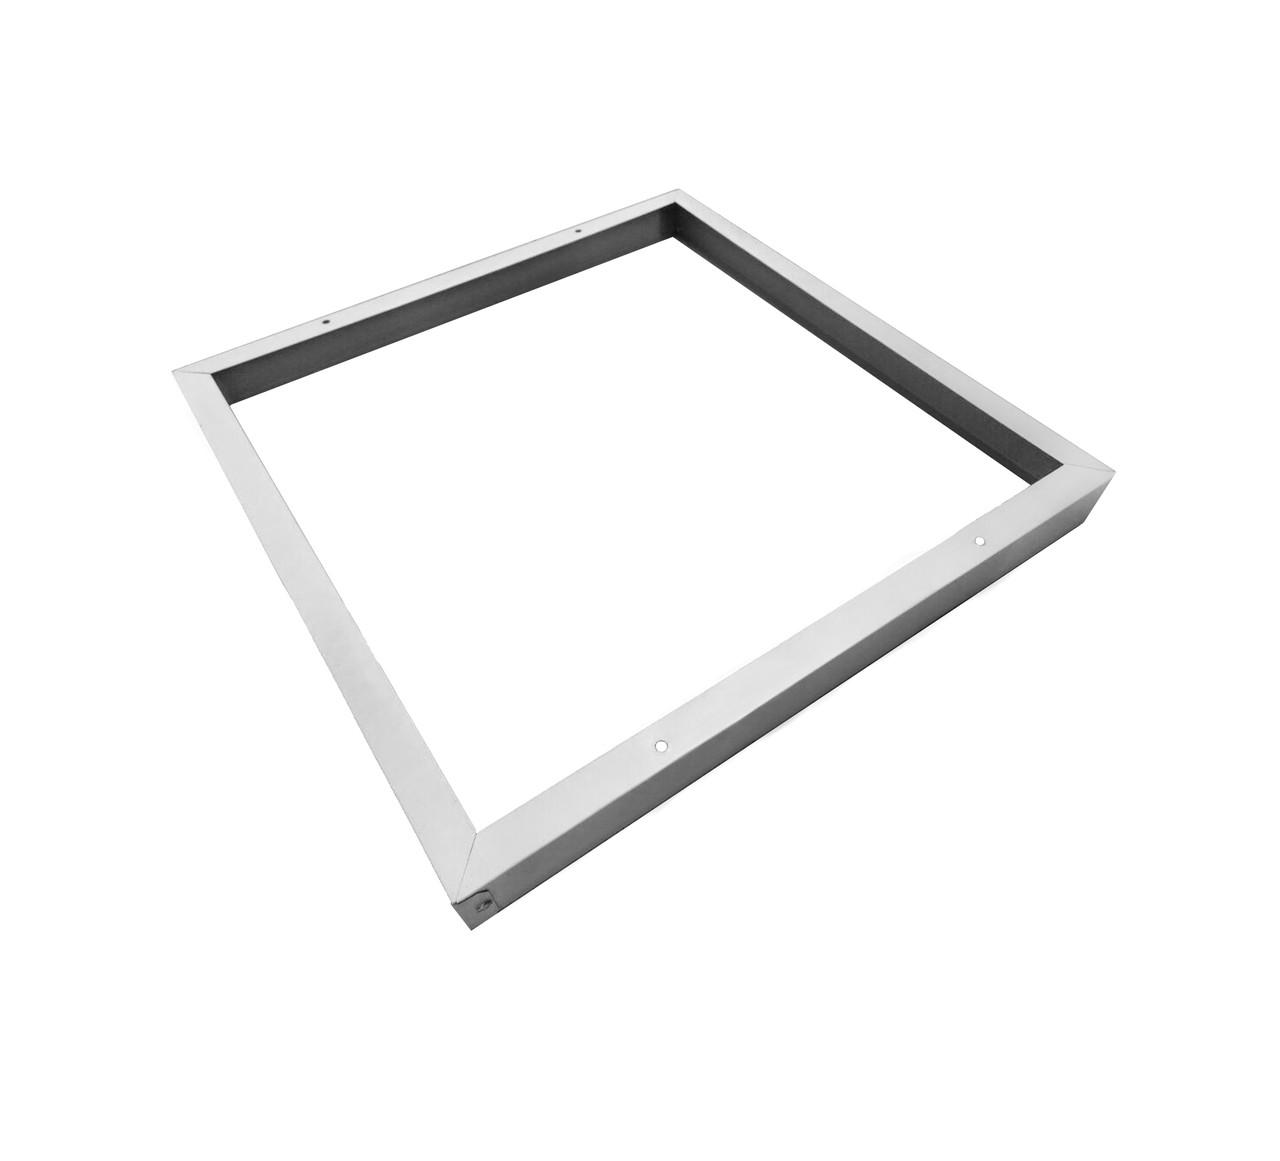 Рамка для накладного монтажа LED панелей 600х600